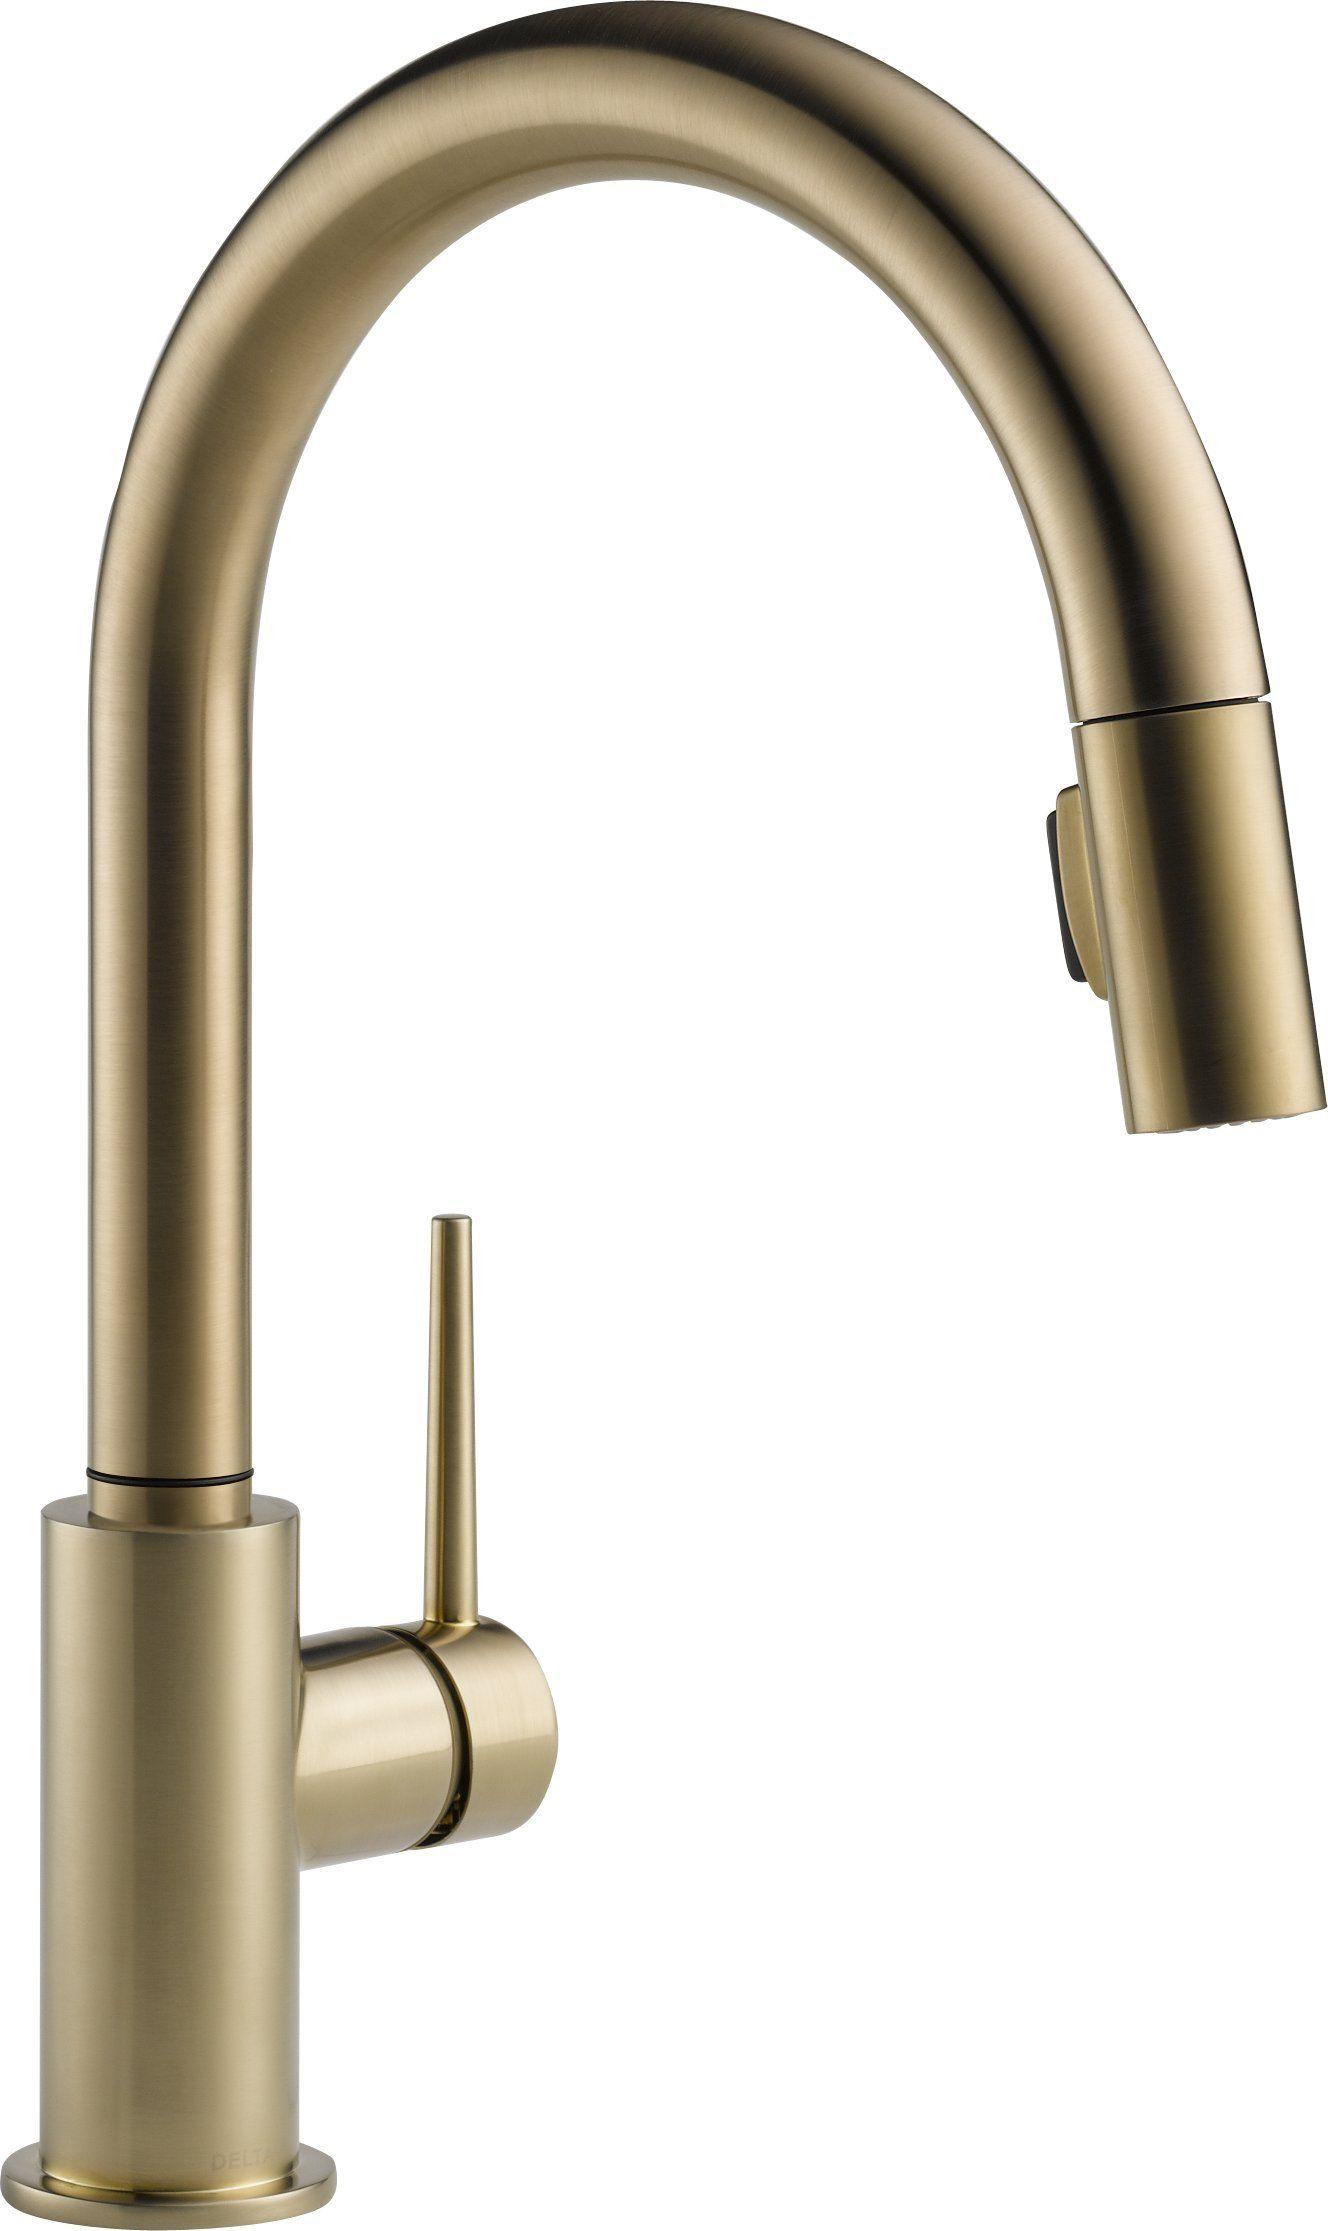 Delta 9159-CZ-DST Single Handle Pull-Down Kitchen Faucet ...